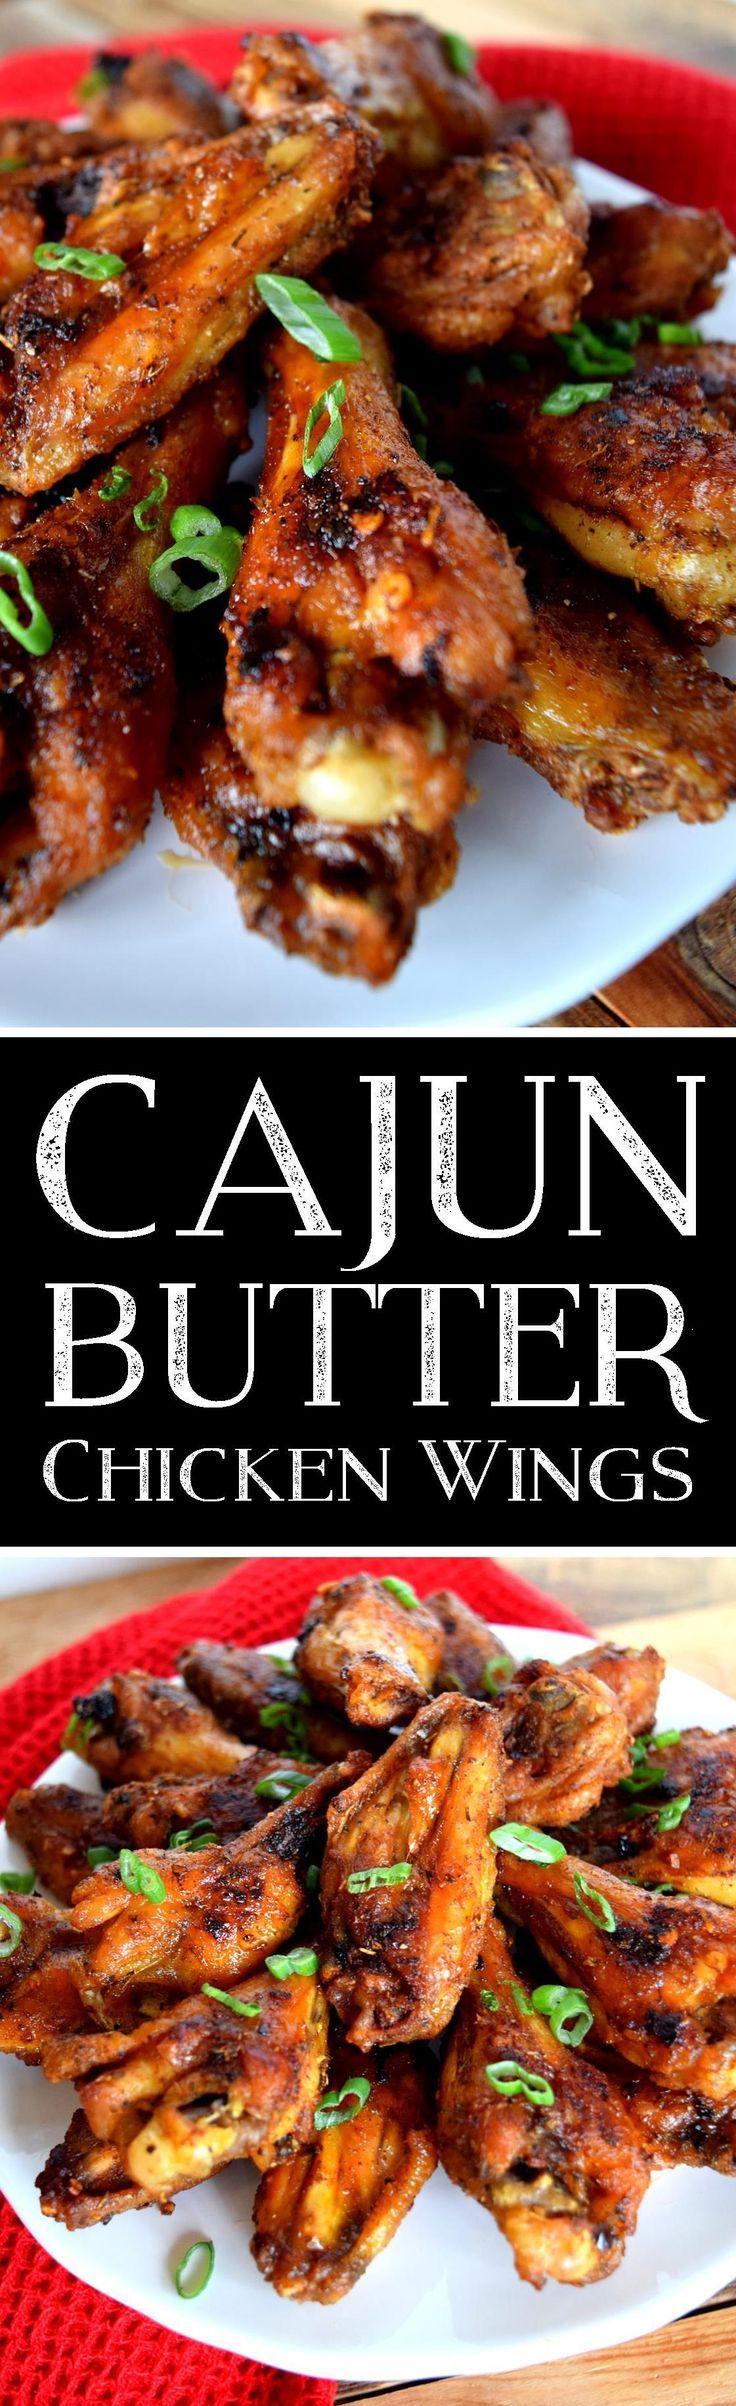 Cajun Butter Chicken Wings